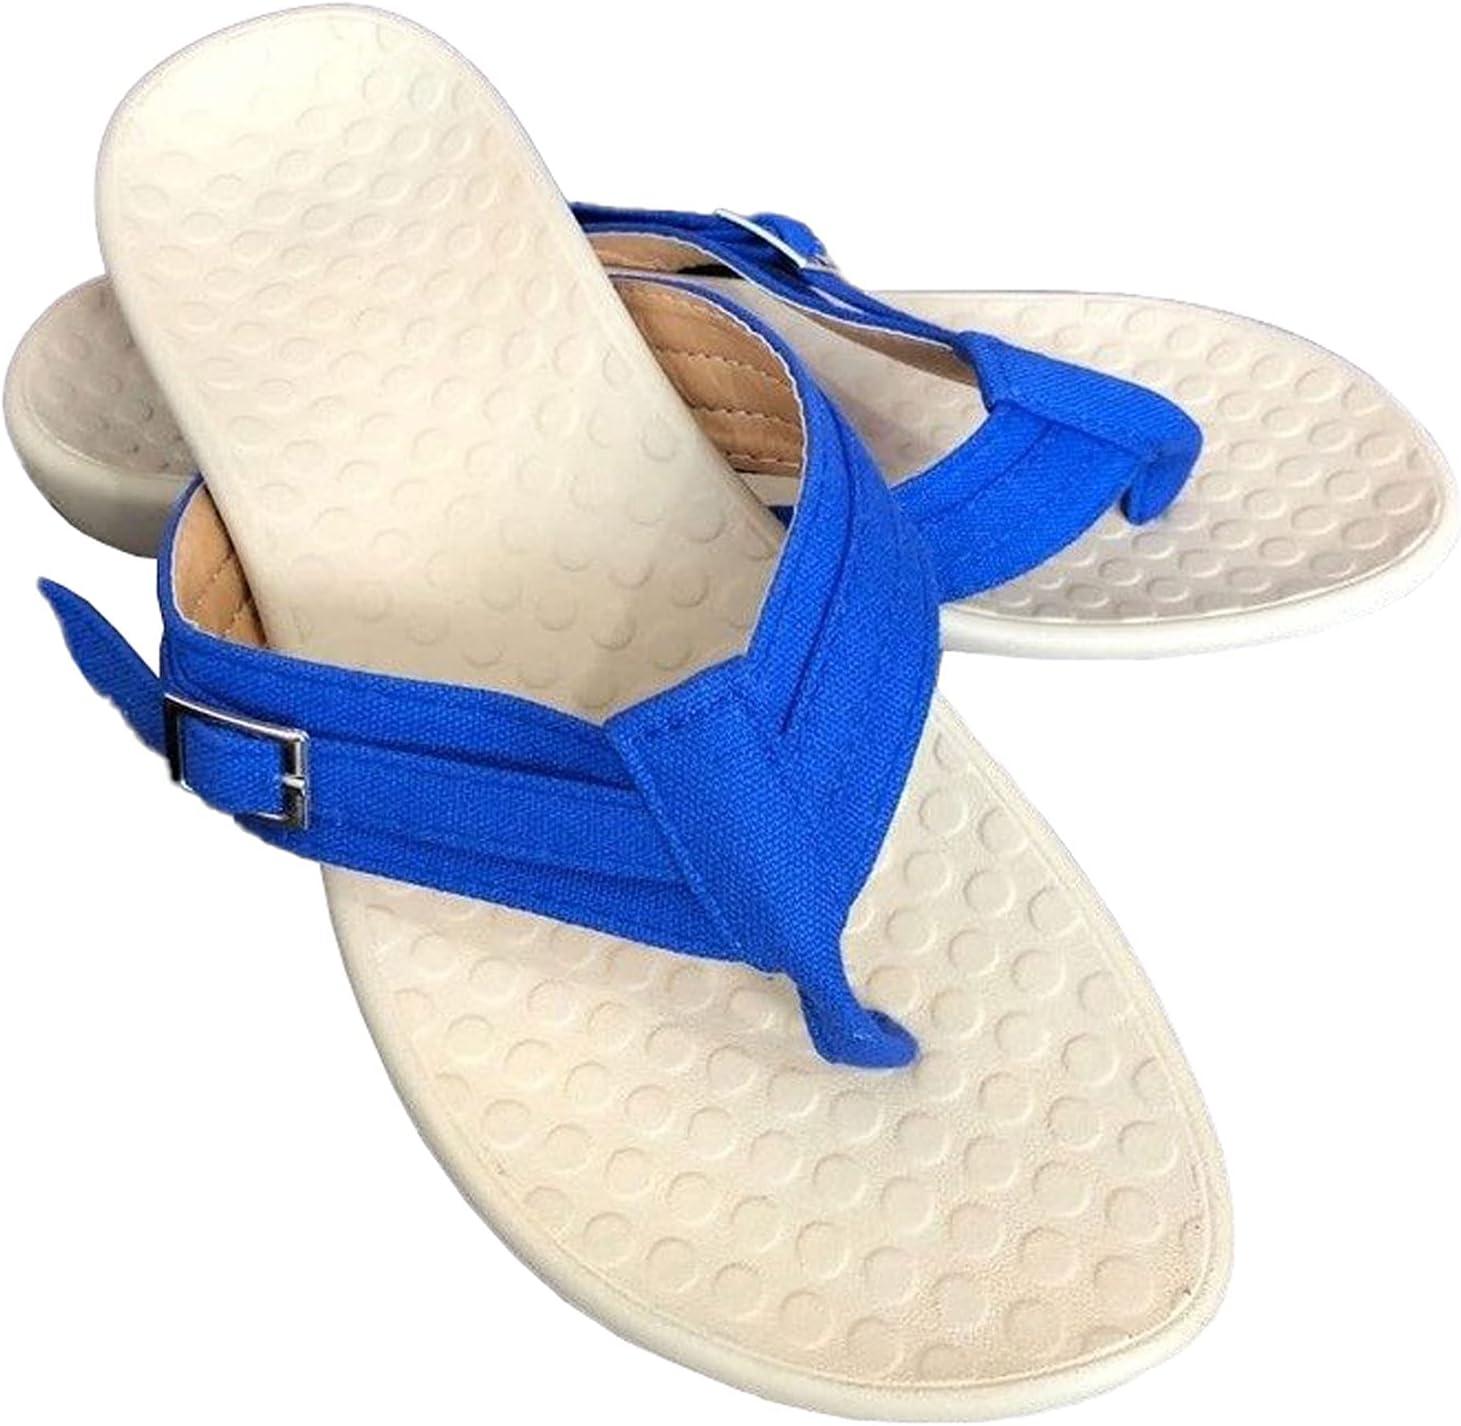 COOLL Flip Flops Women,Adjustable Metal Buckle Sandals,Orthotic Sandals,5-12 Sizes Royal Blue-7